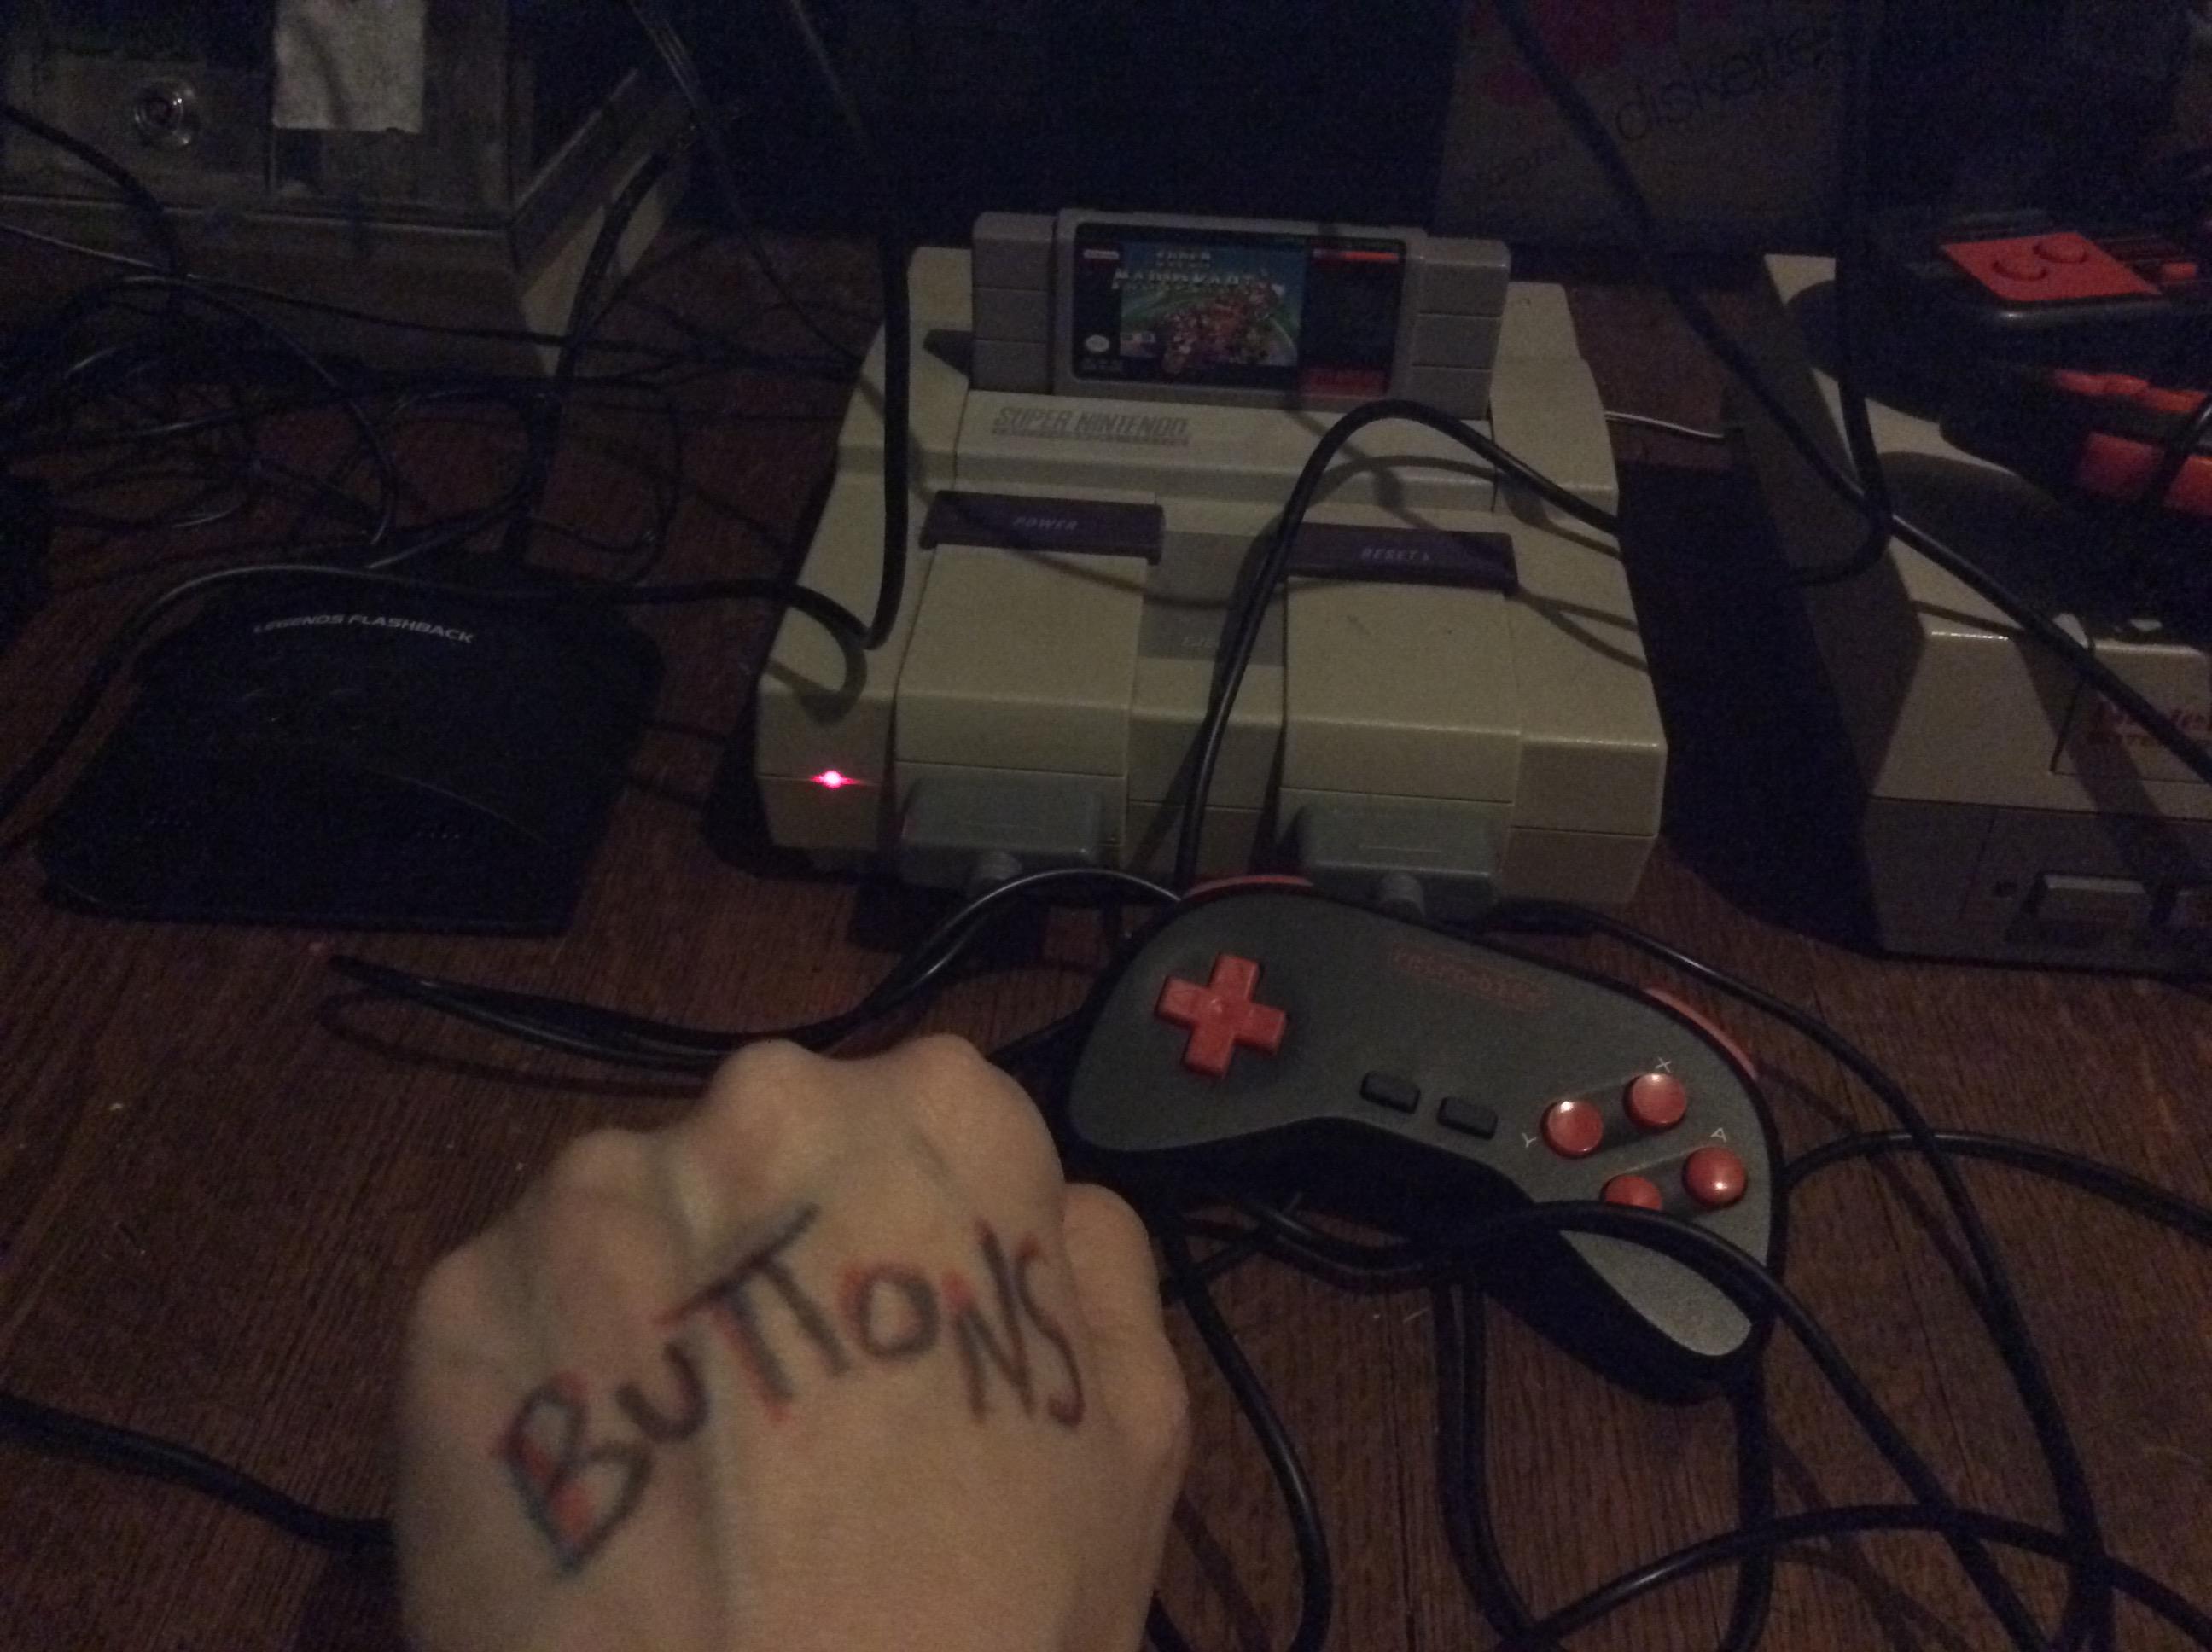 Super Mario Kart: Bowser Castle 2 [Time Trial] time of 0:02:44.9